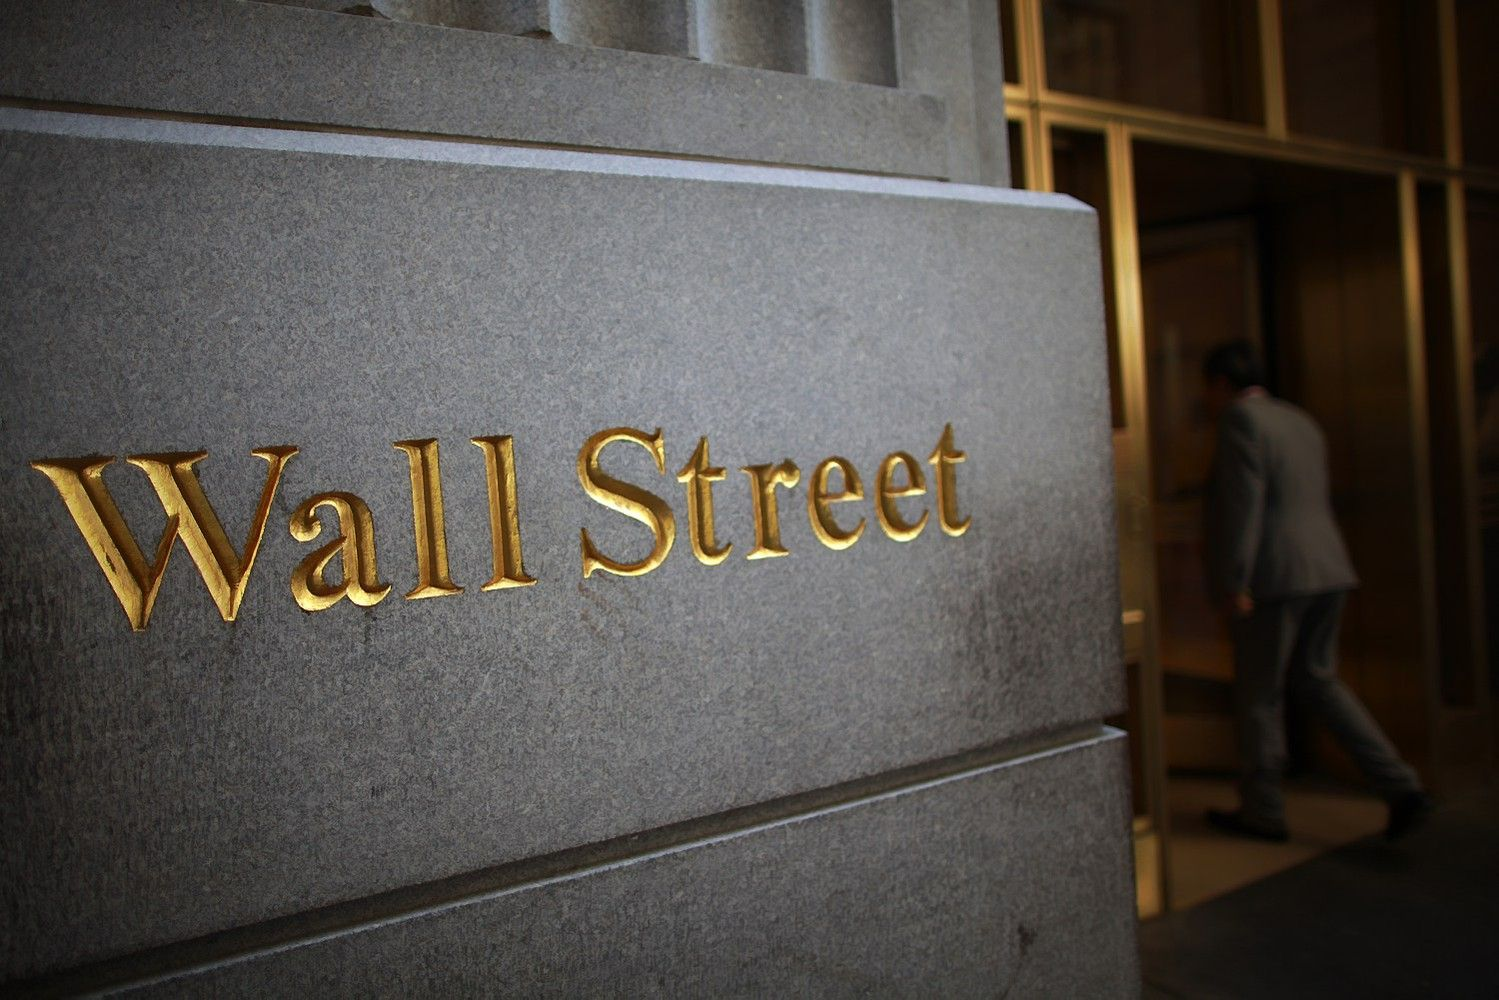 Wall Street Banks Warn Downturn Is Coming